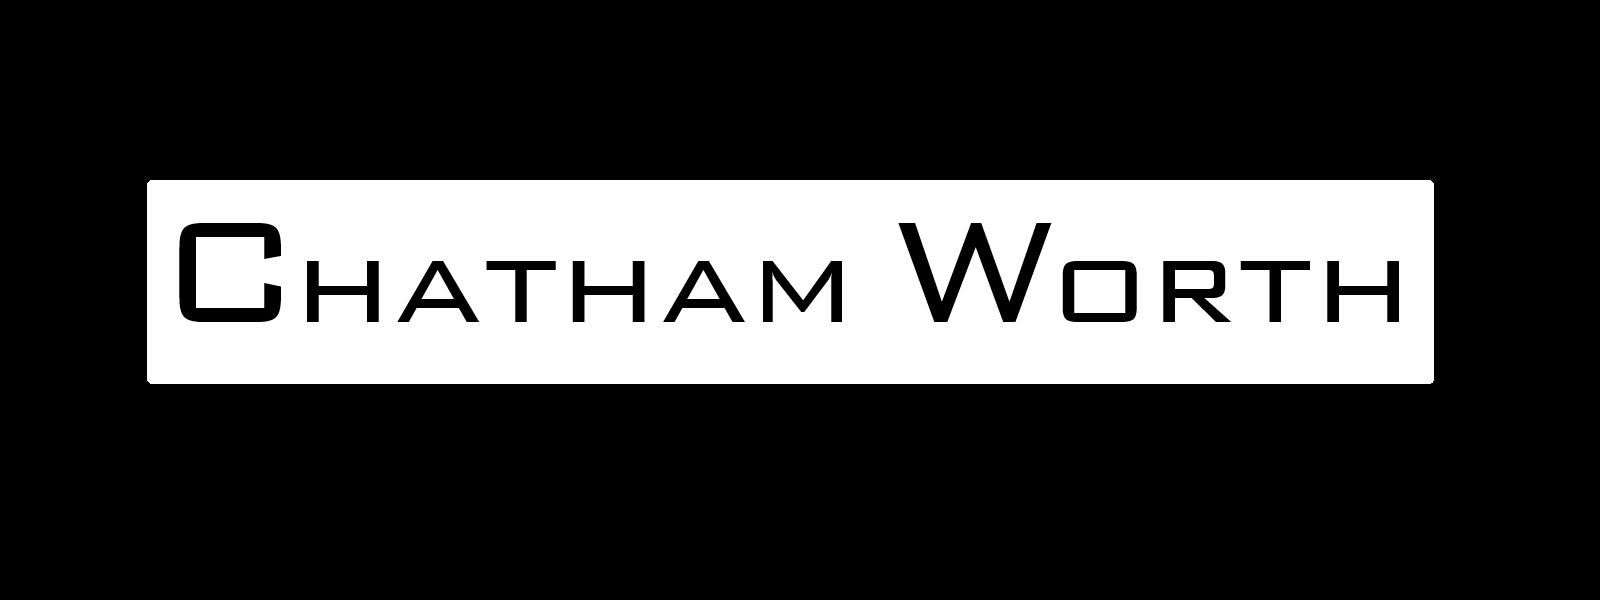 Bark + Build: Chatham Worth logo